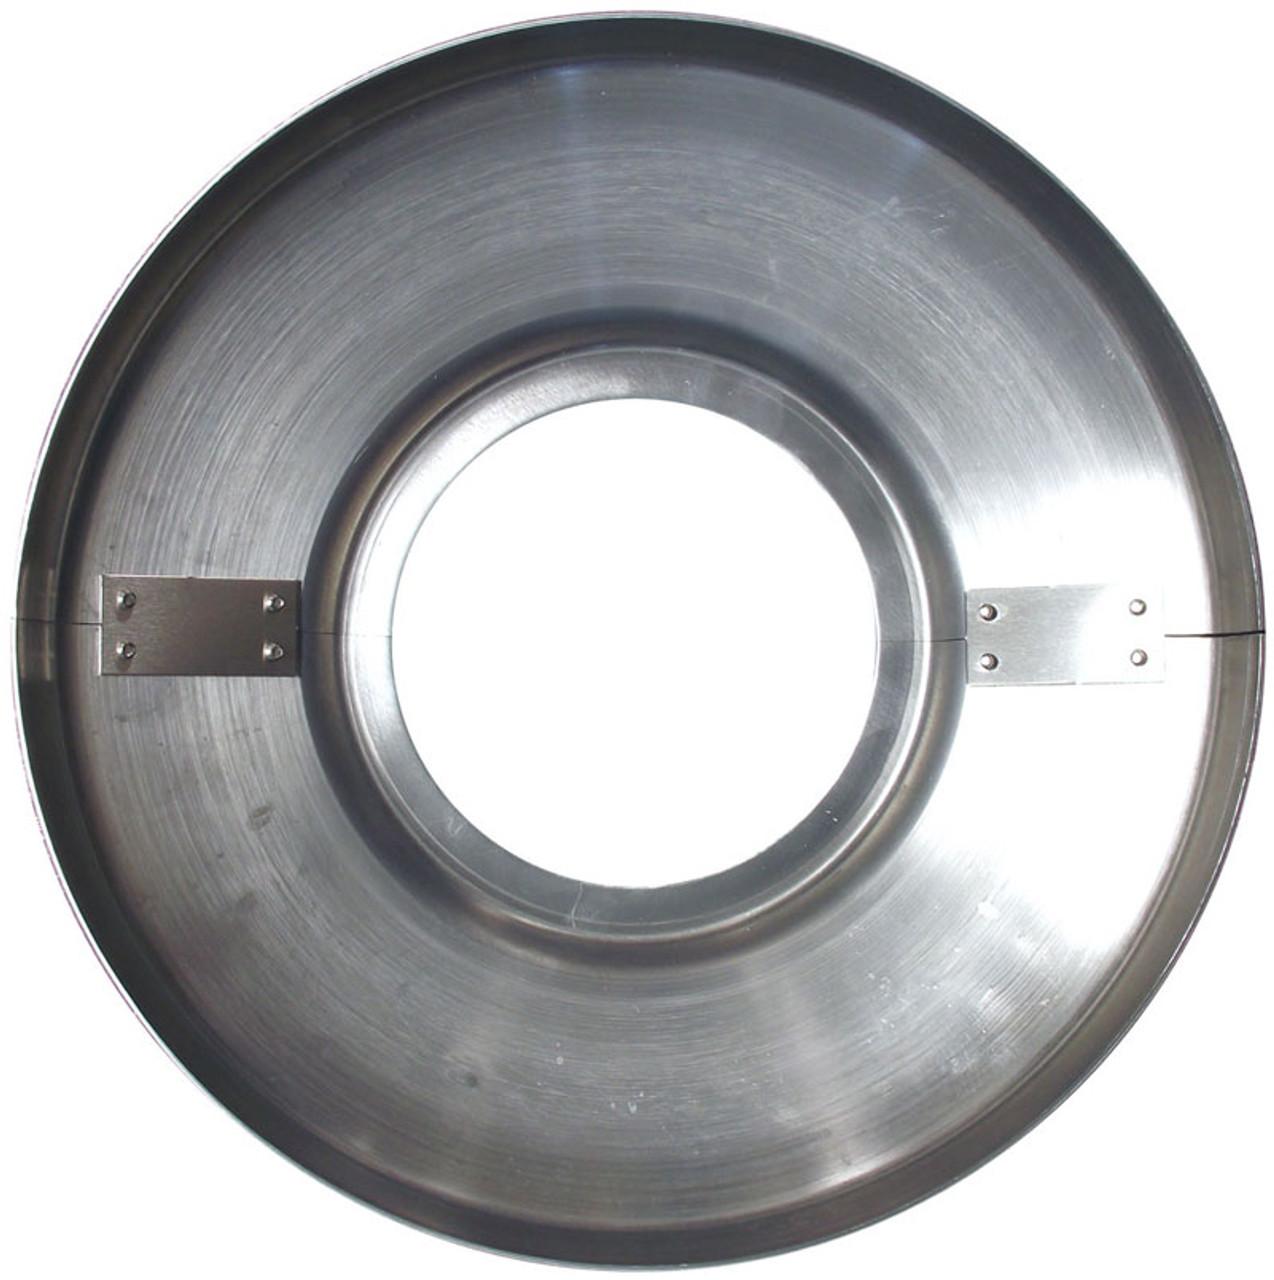 Split High Profile Flag Pole Flash Collar